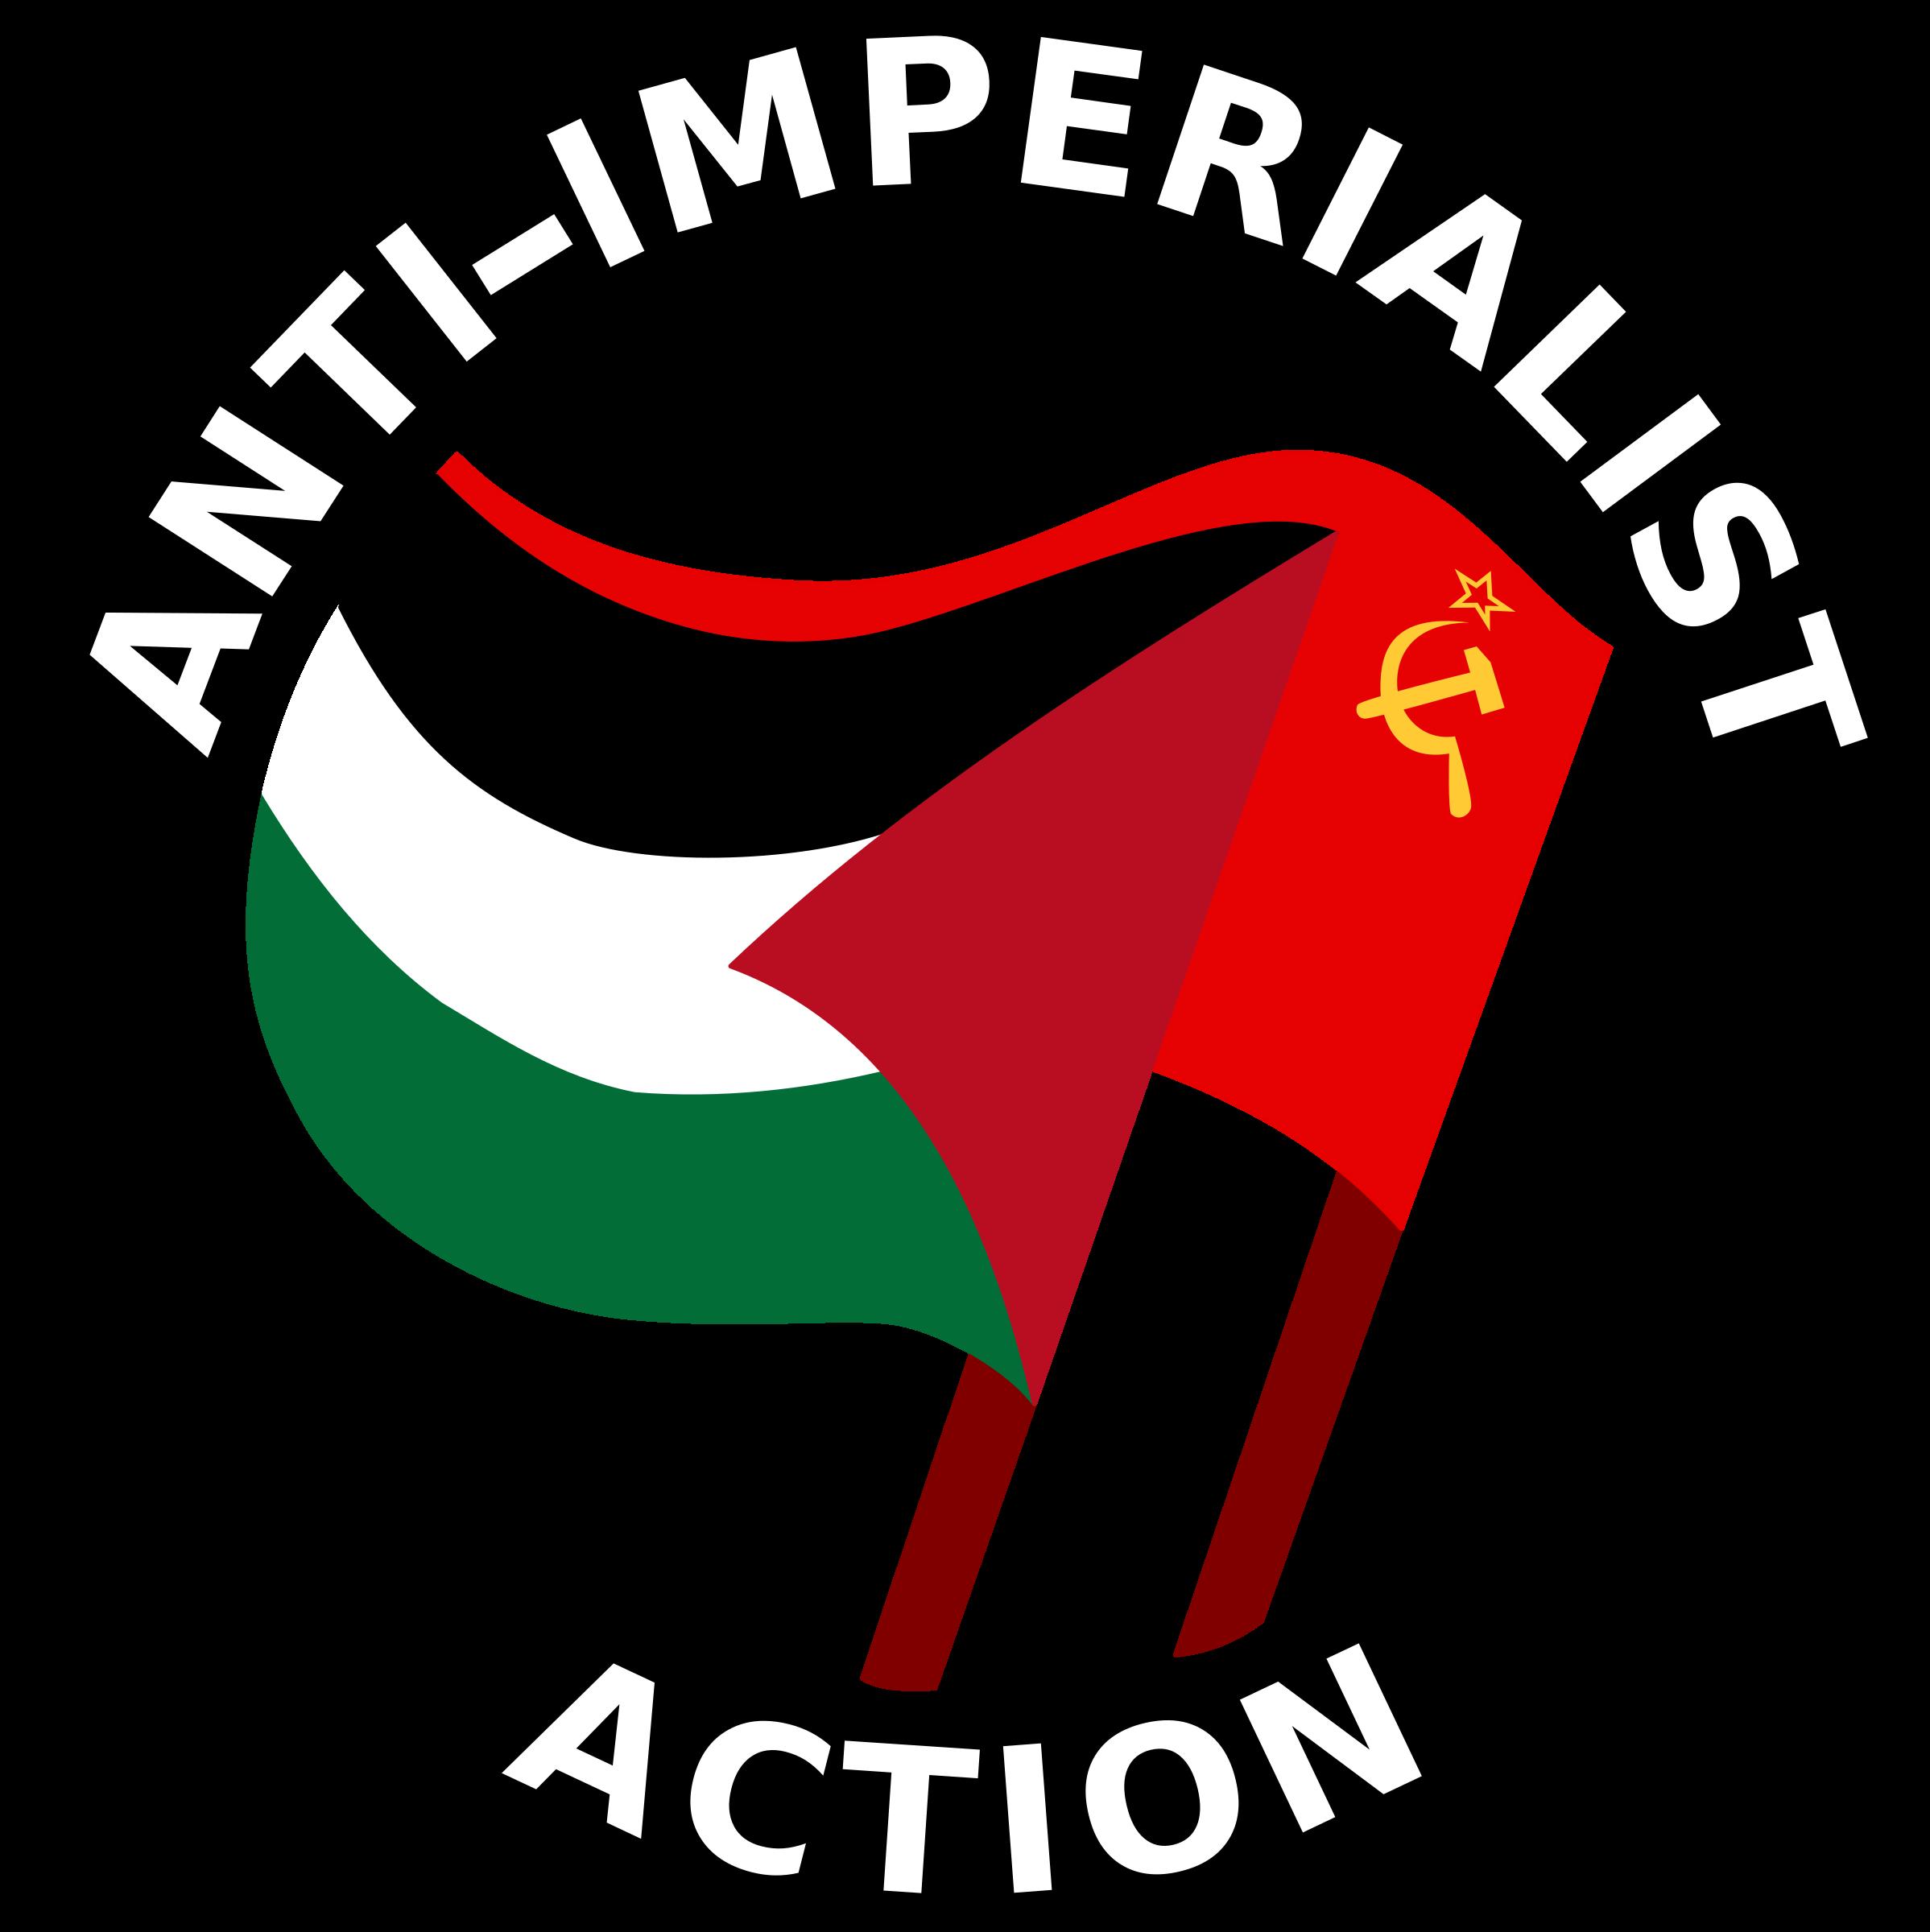 svg transparent Action clipart. Anti imperialist big image